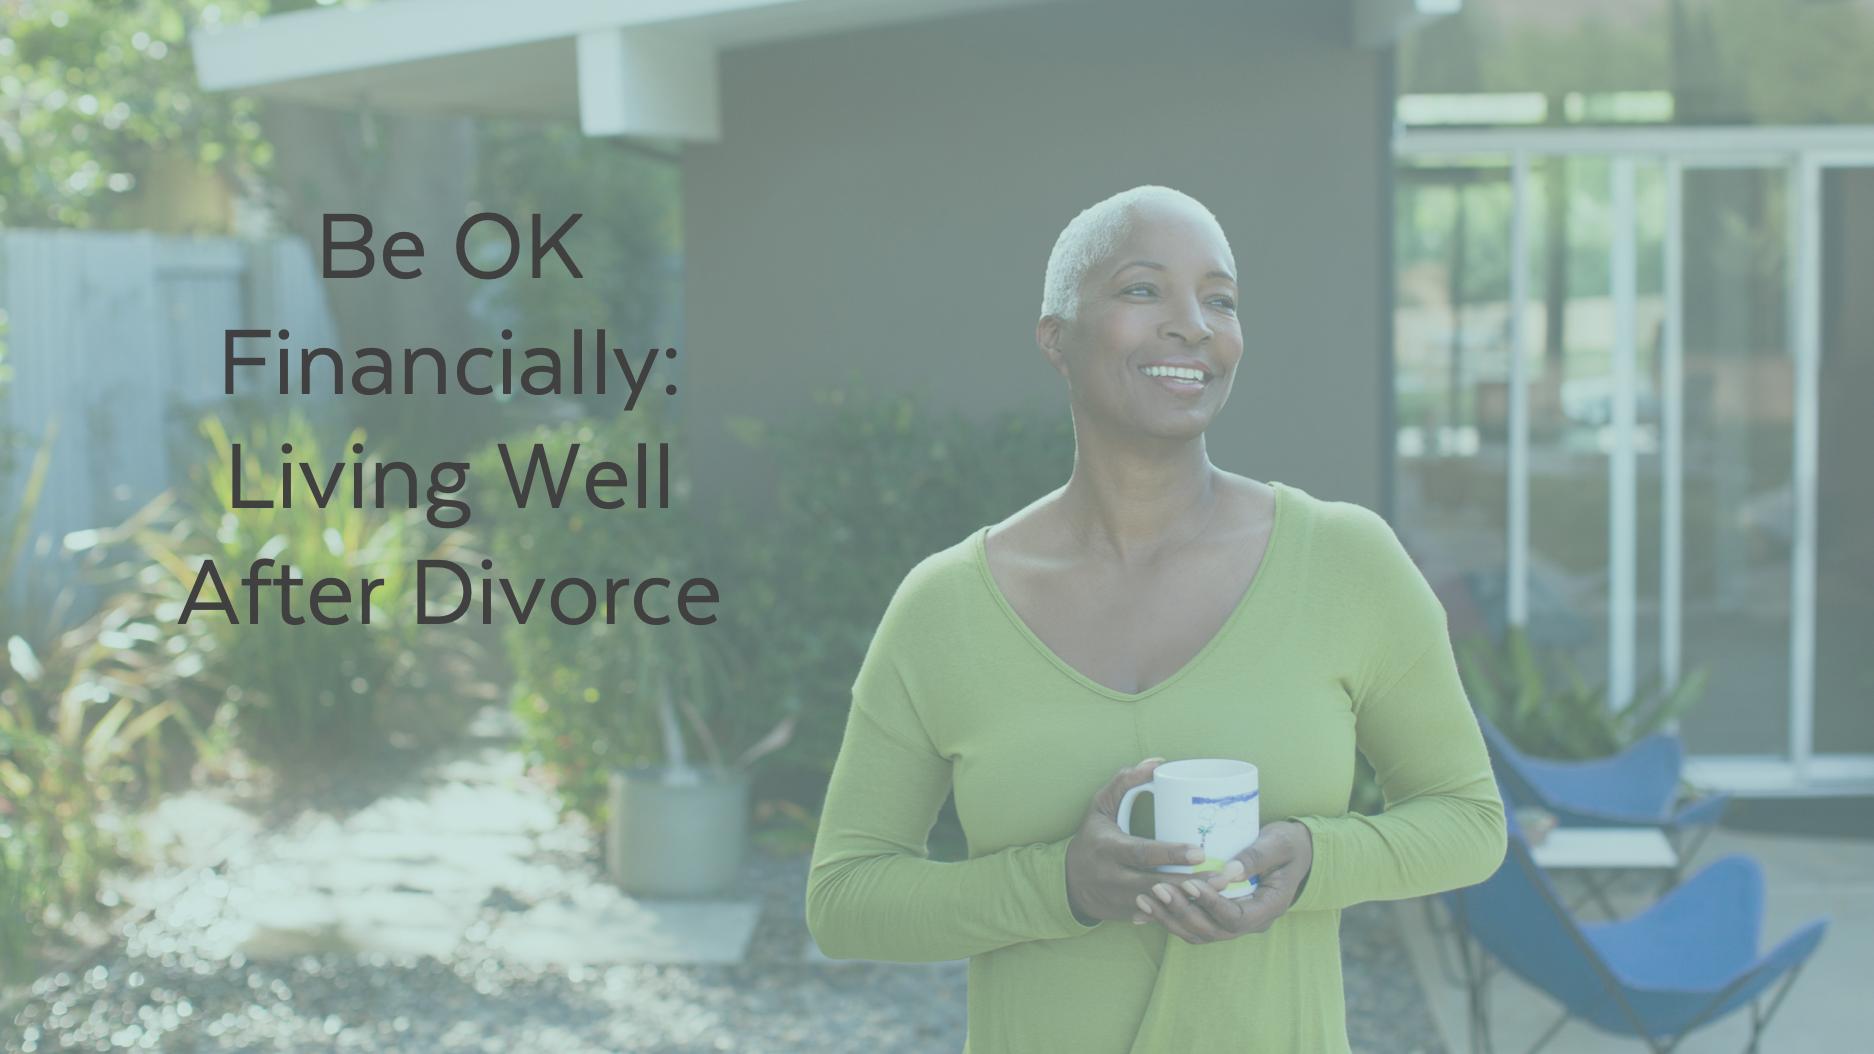 Be OK Financially